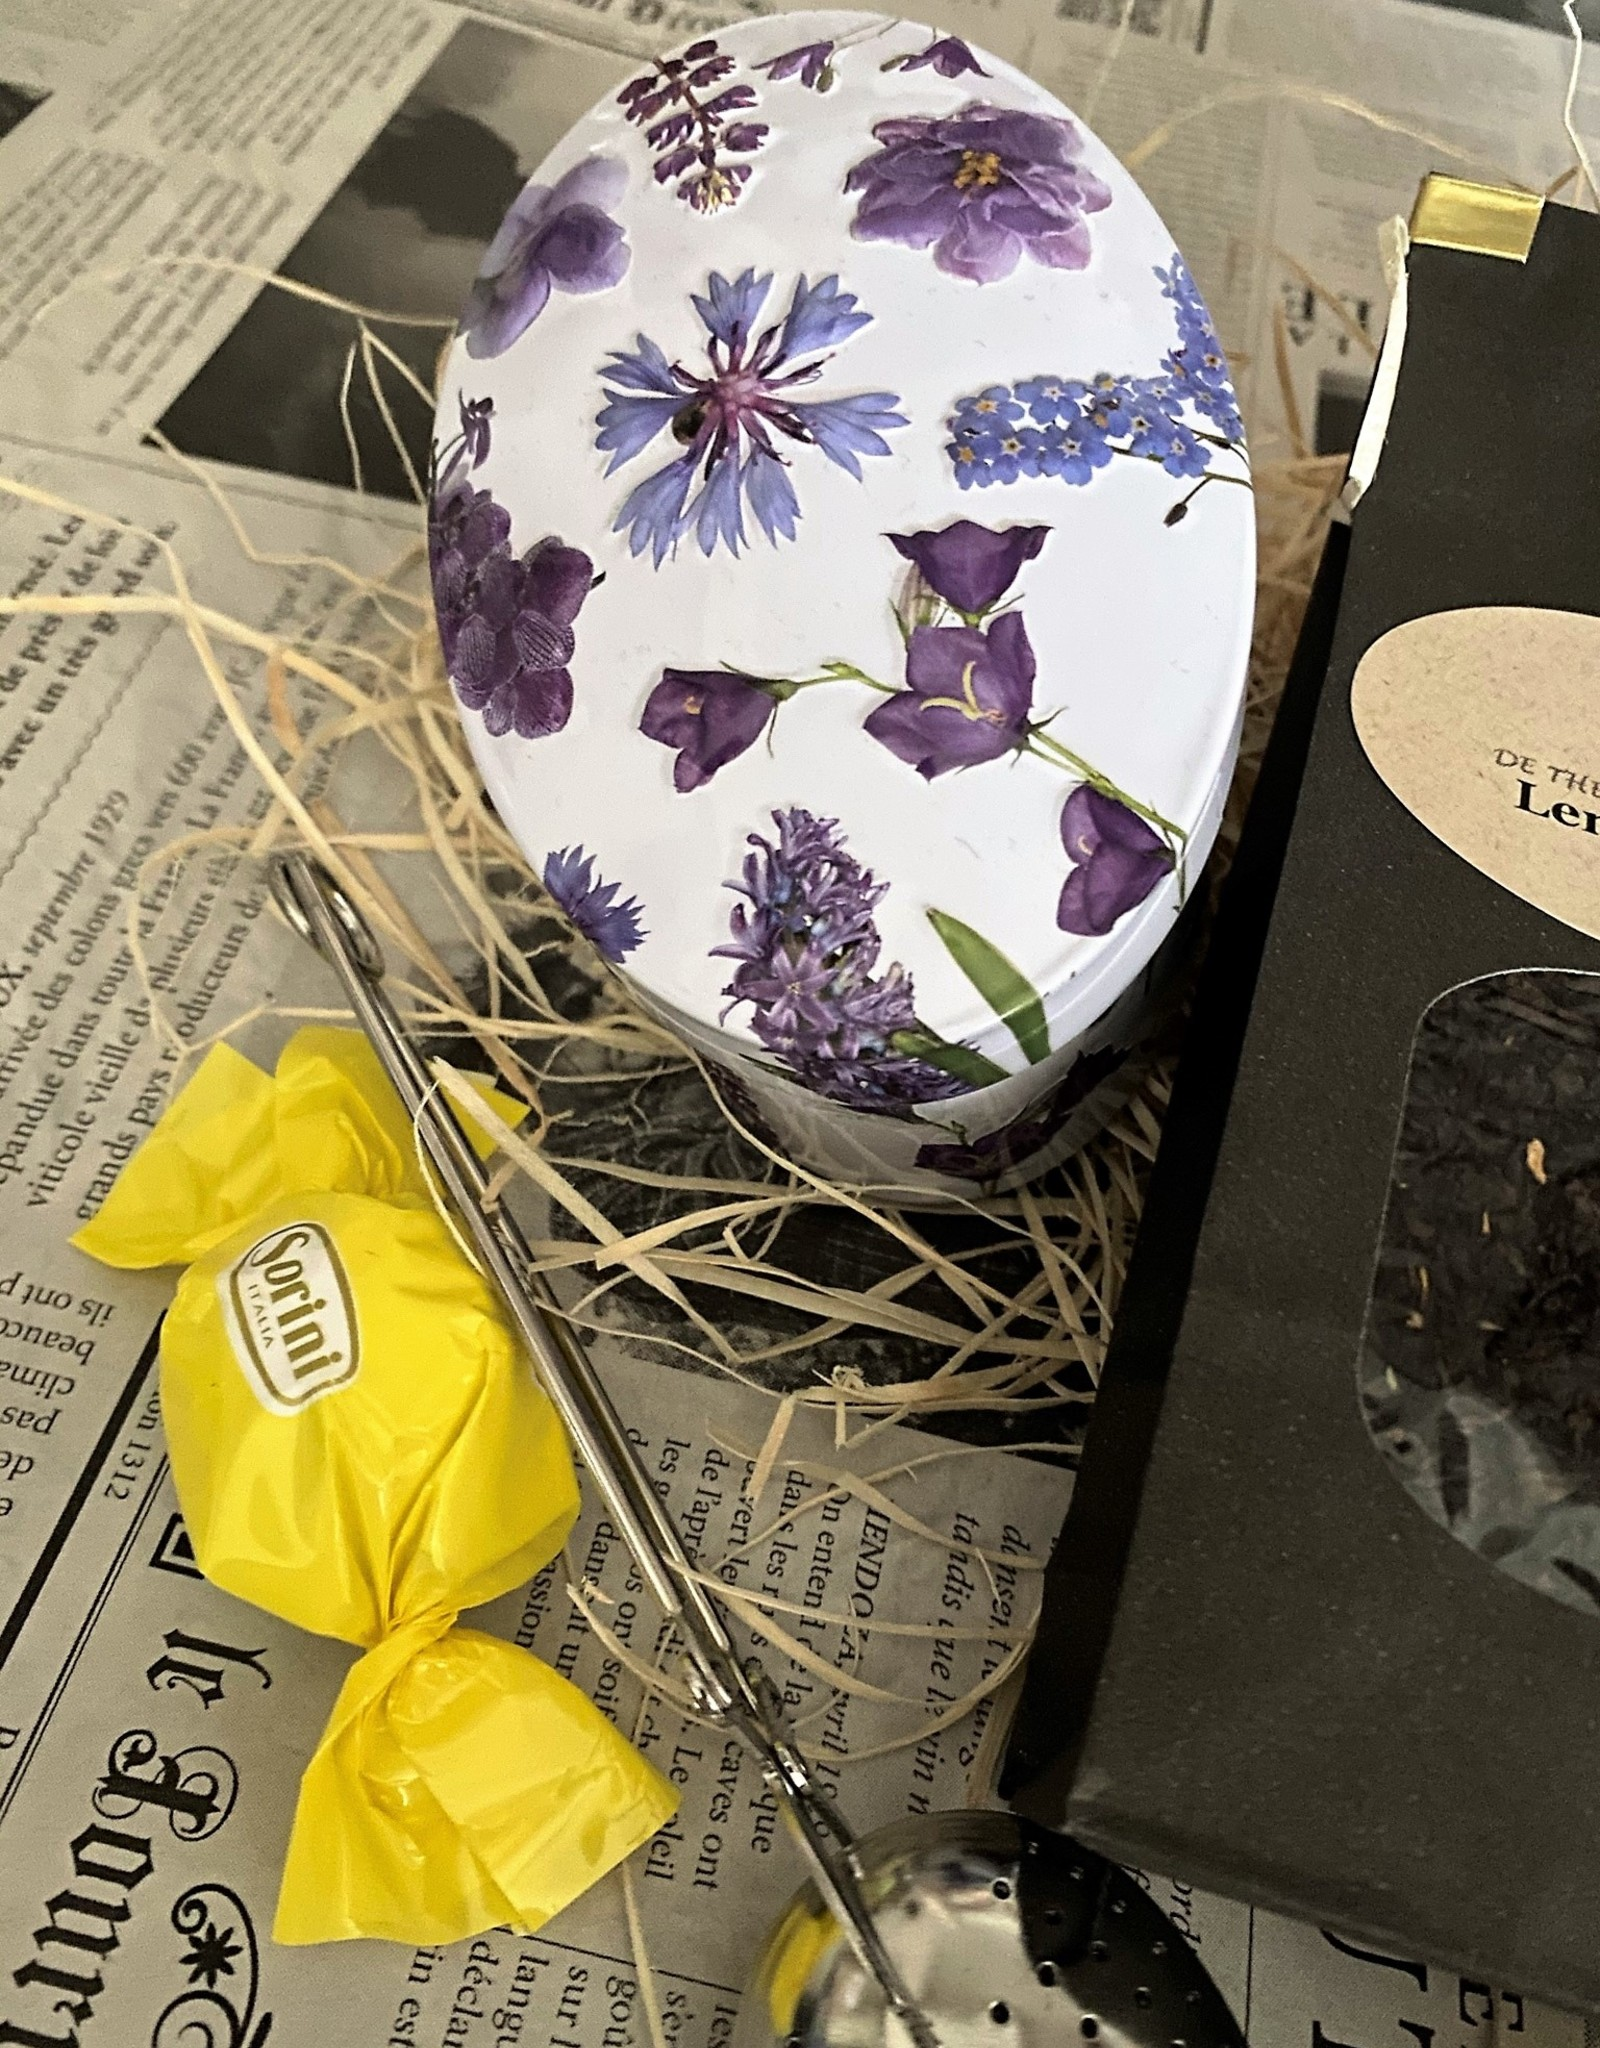 Voorjaarspakketje met theeblikje, lentethee en fudge